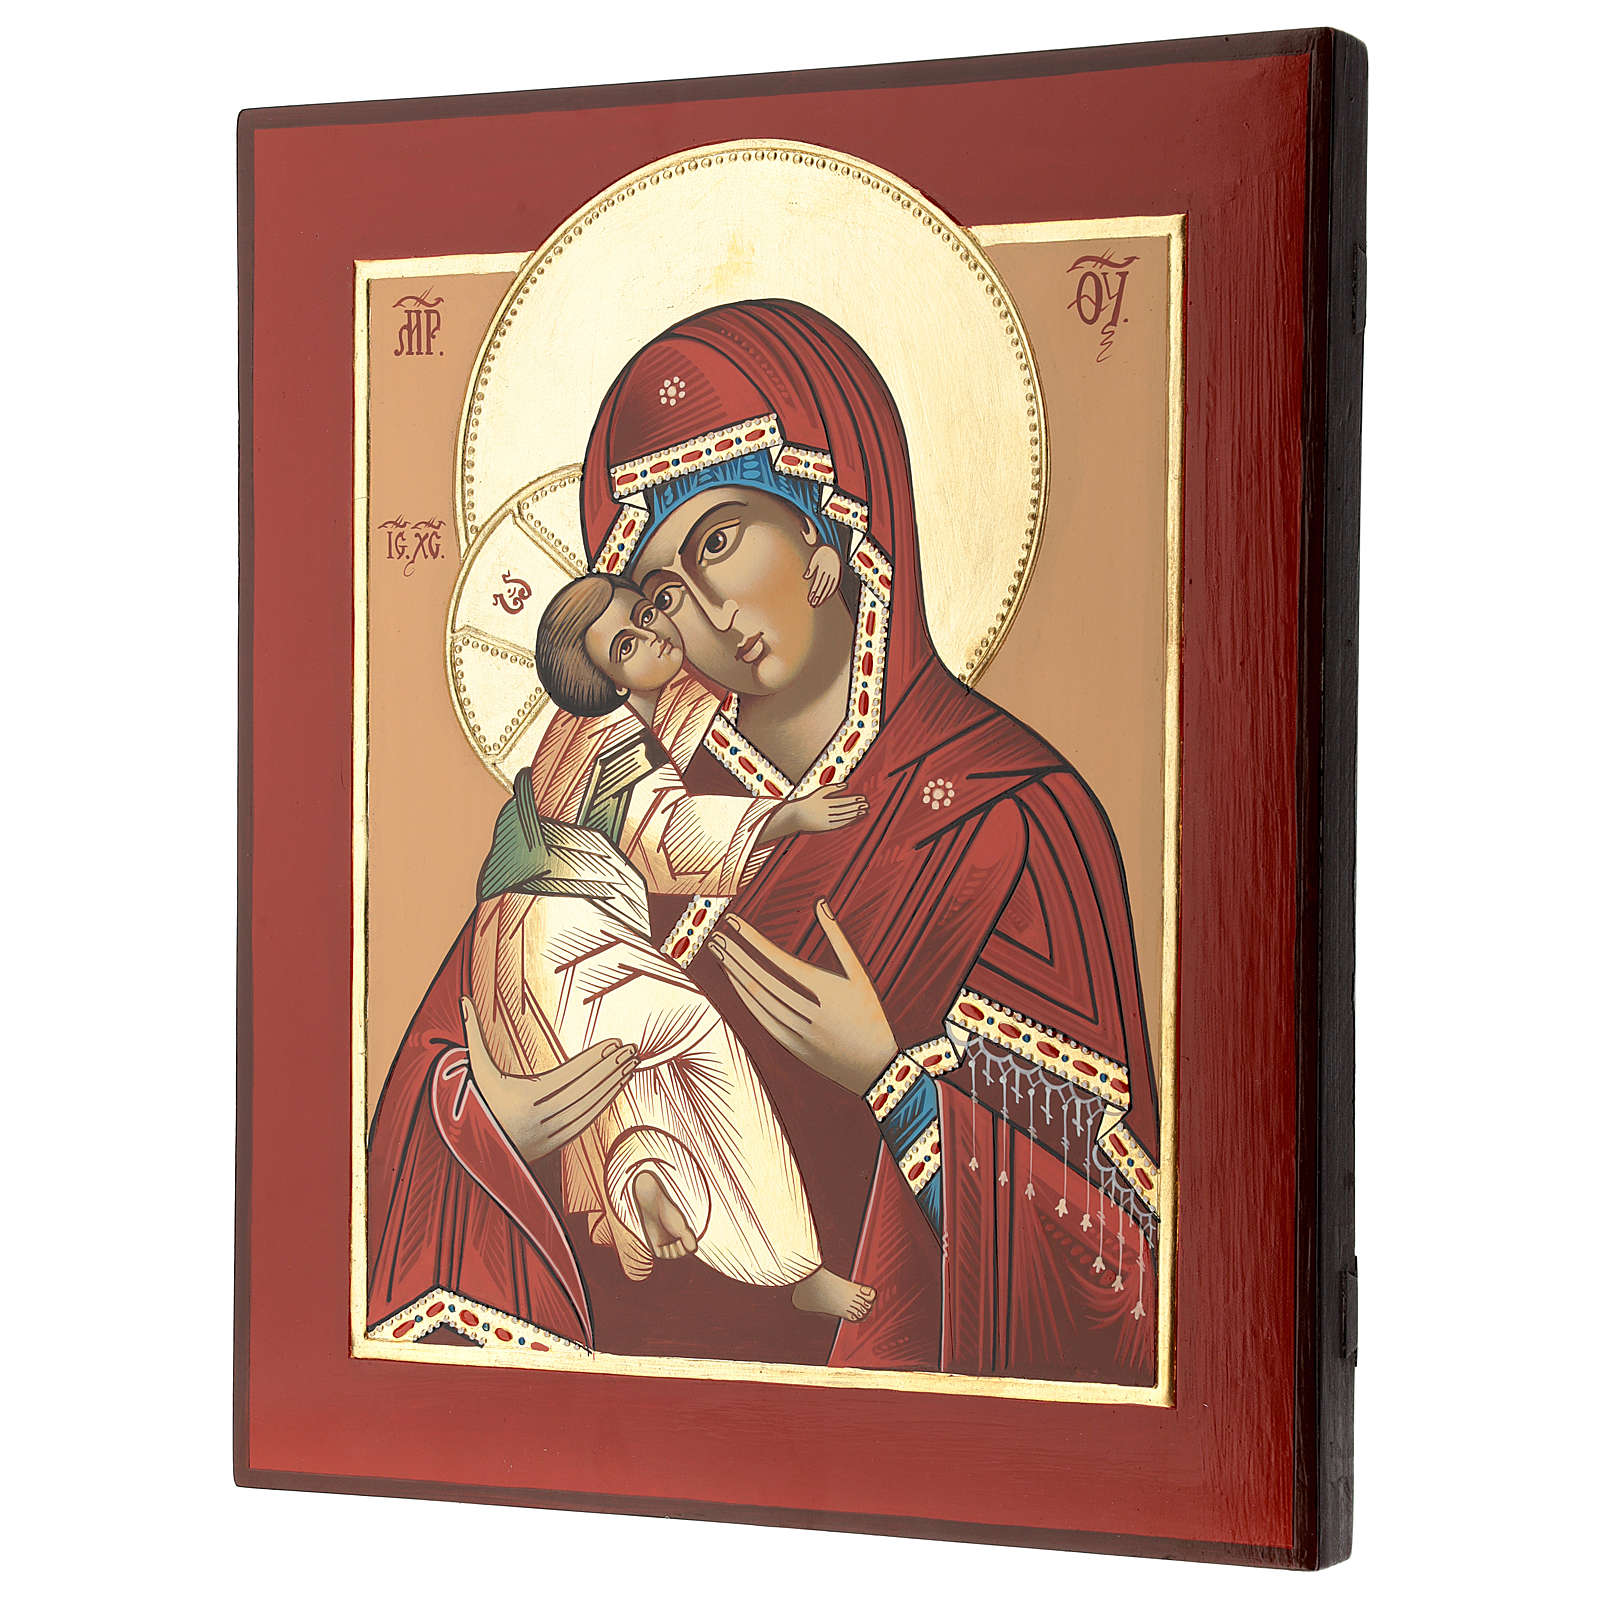 Icône Vierge de Tendresse Vladimirskaja 35x30 cm Roumanie peinte style  russe 4